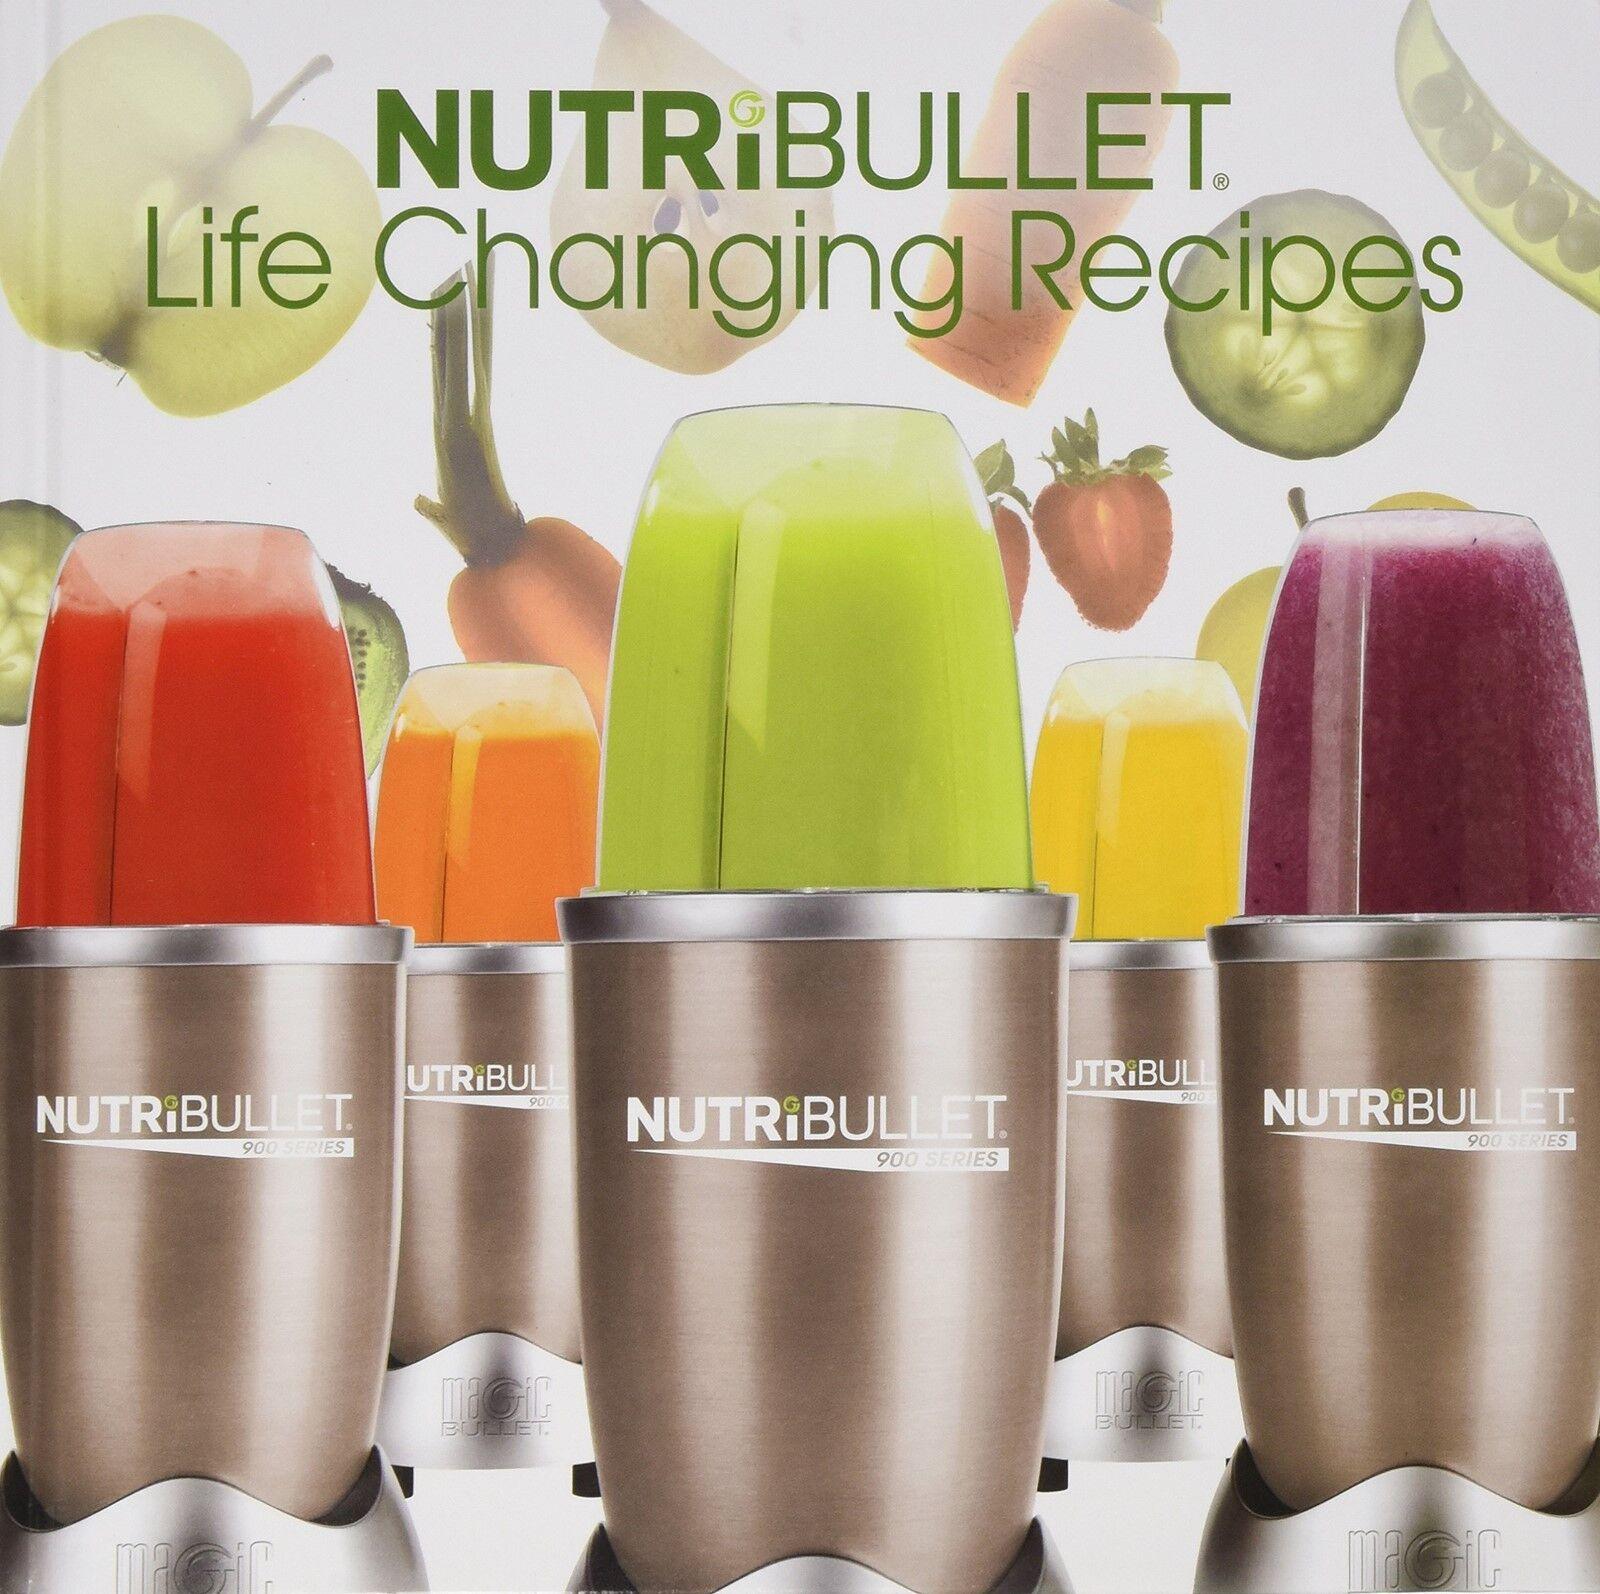 NUTRIBULLET Life Changing Recettes livre NUTRI BULLET livraison gratuite  New from box